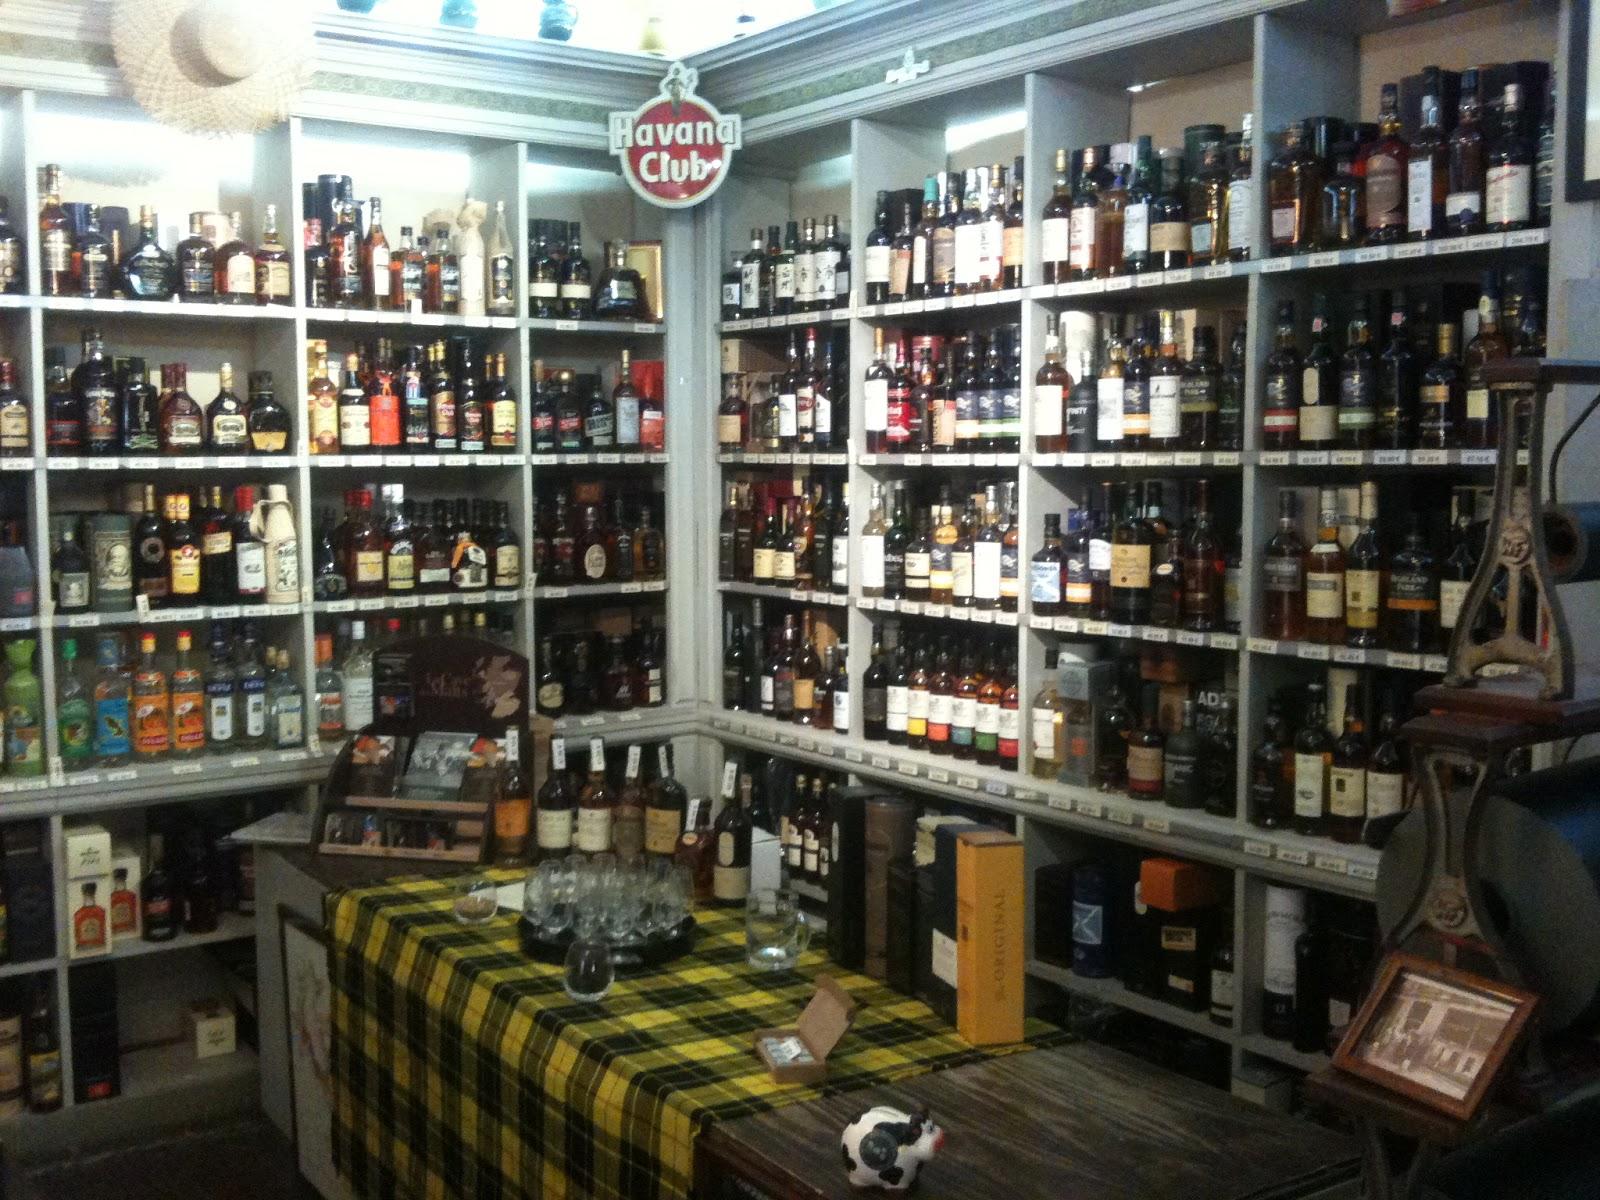 aux grands vins de france club d gustation whisky chez le. Black Bedroom Furniture Sets. Home Design Ideas